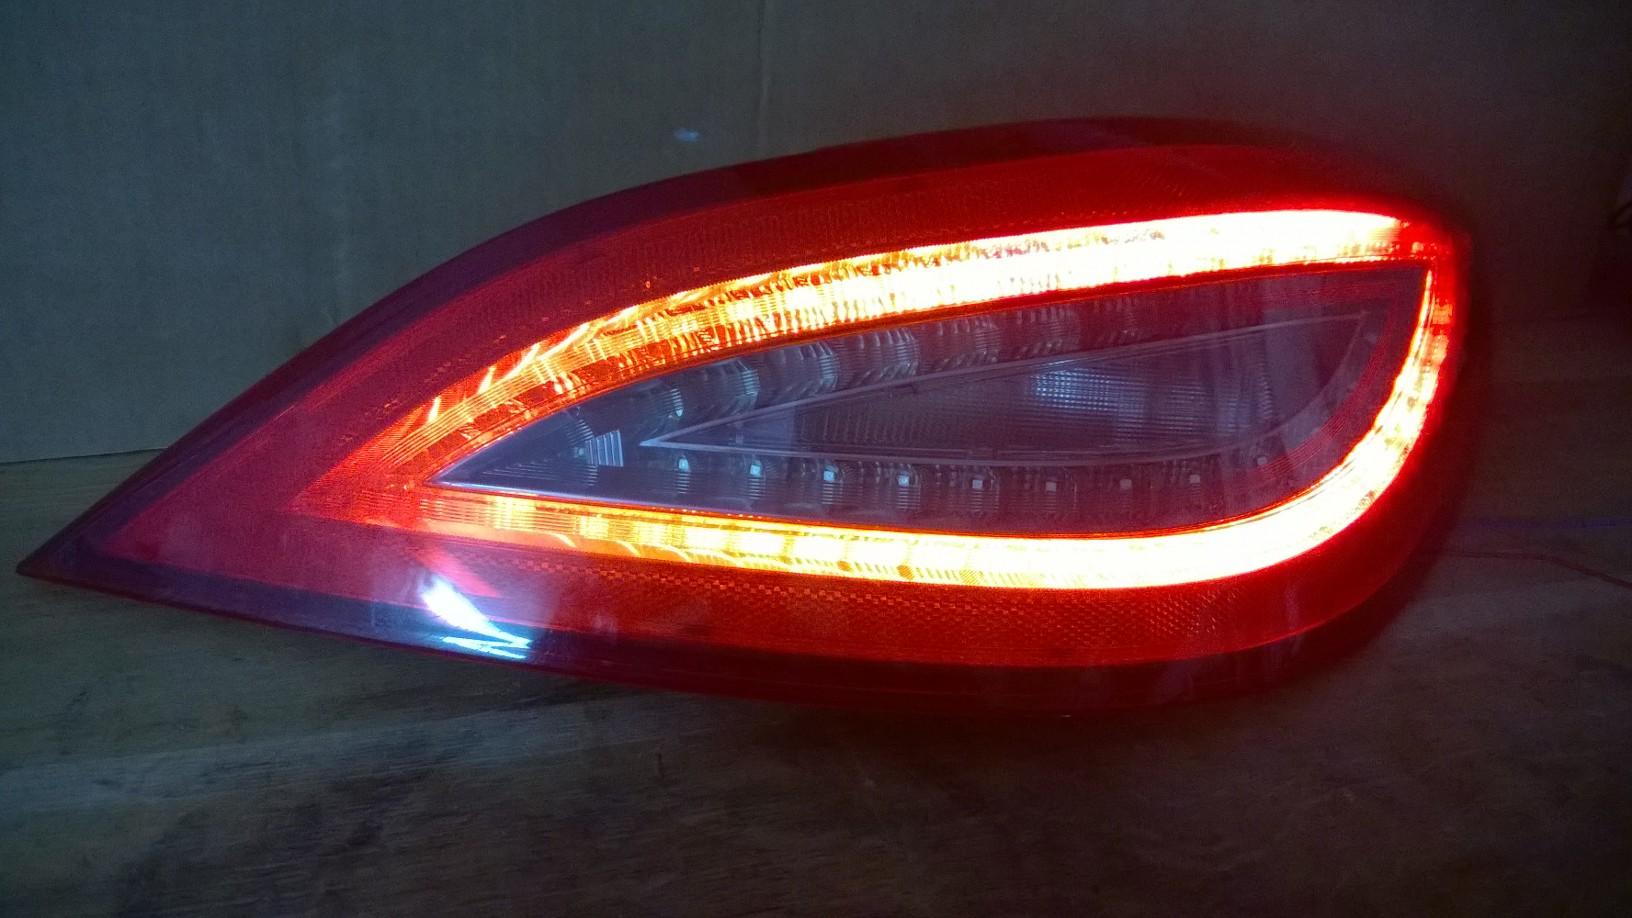 Reparatur von lampen tylnych led mercedes cls w218 for Lampen reparatur